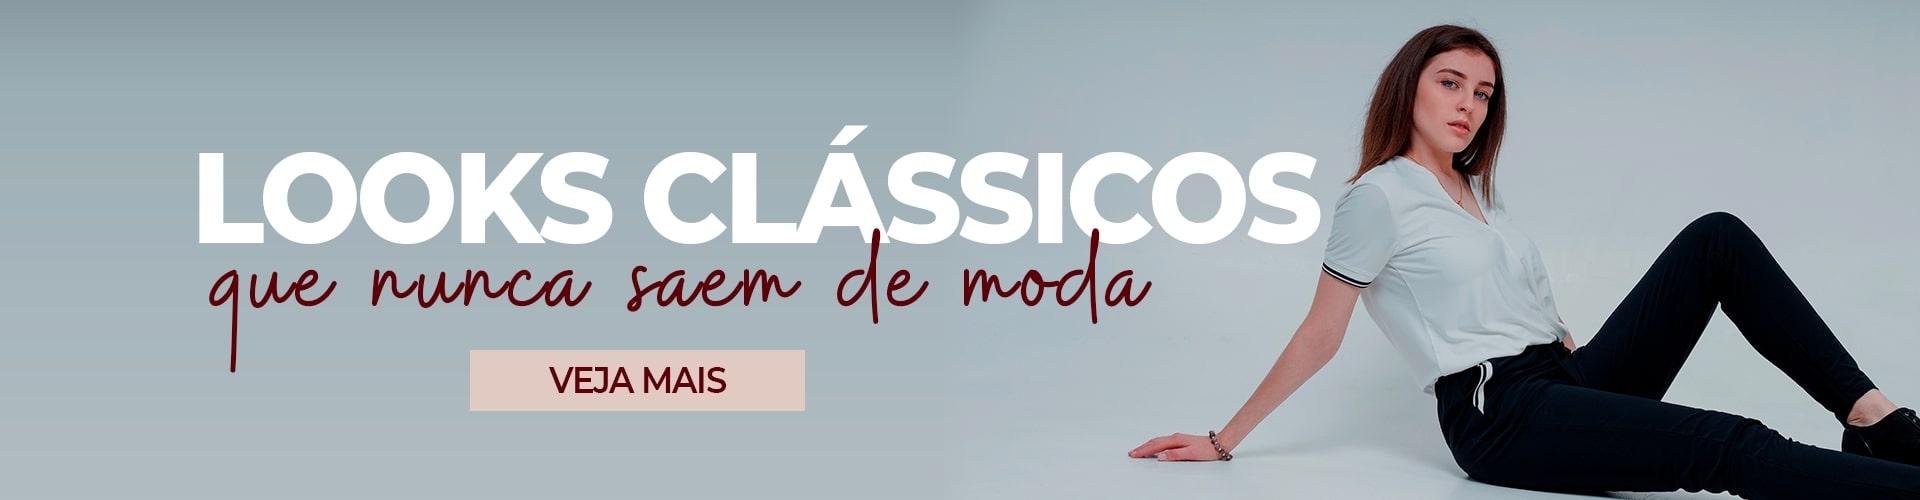 Topo 05: Campanha Estilos>Classicos